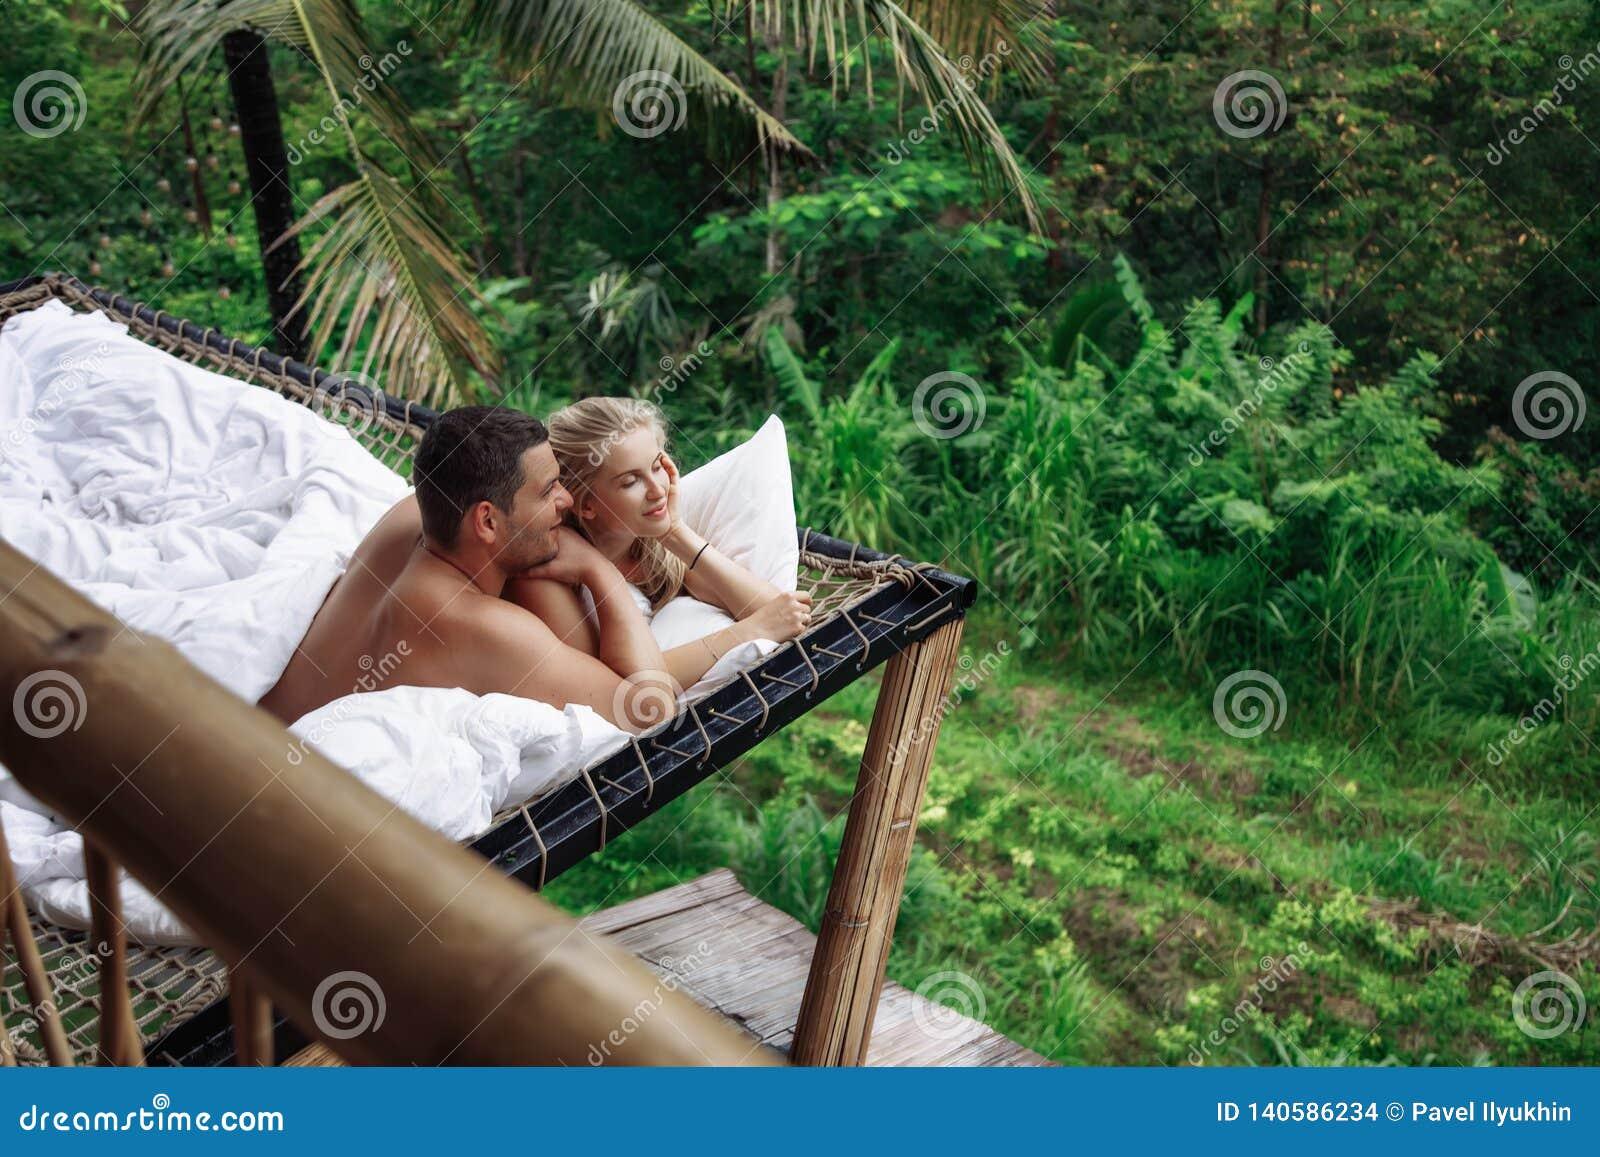 Honeymoon At Bali Ubud Successful Couple Relaxing At Villa Beautiful View Stock Photo Image Of View Travel 140586234